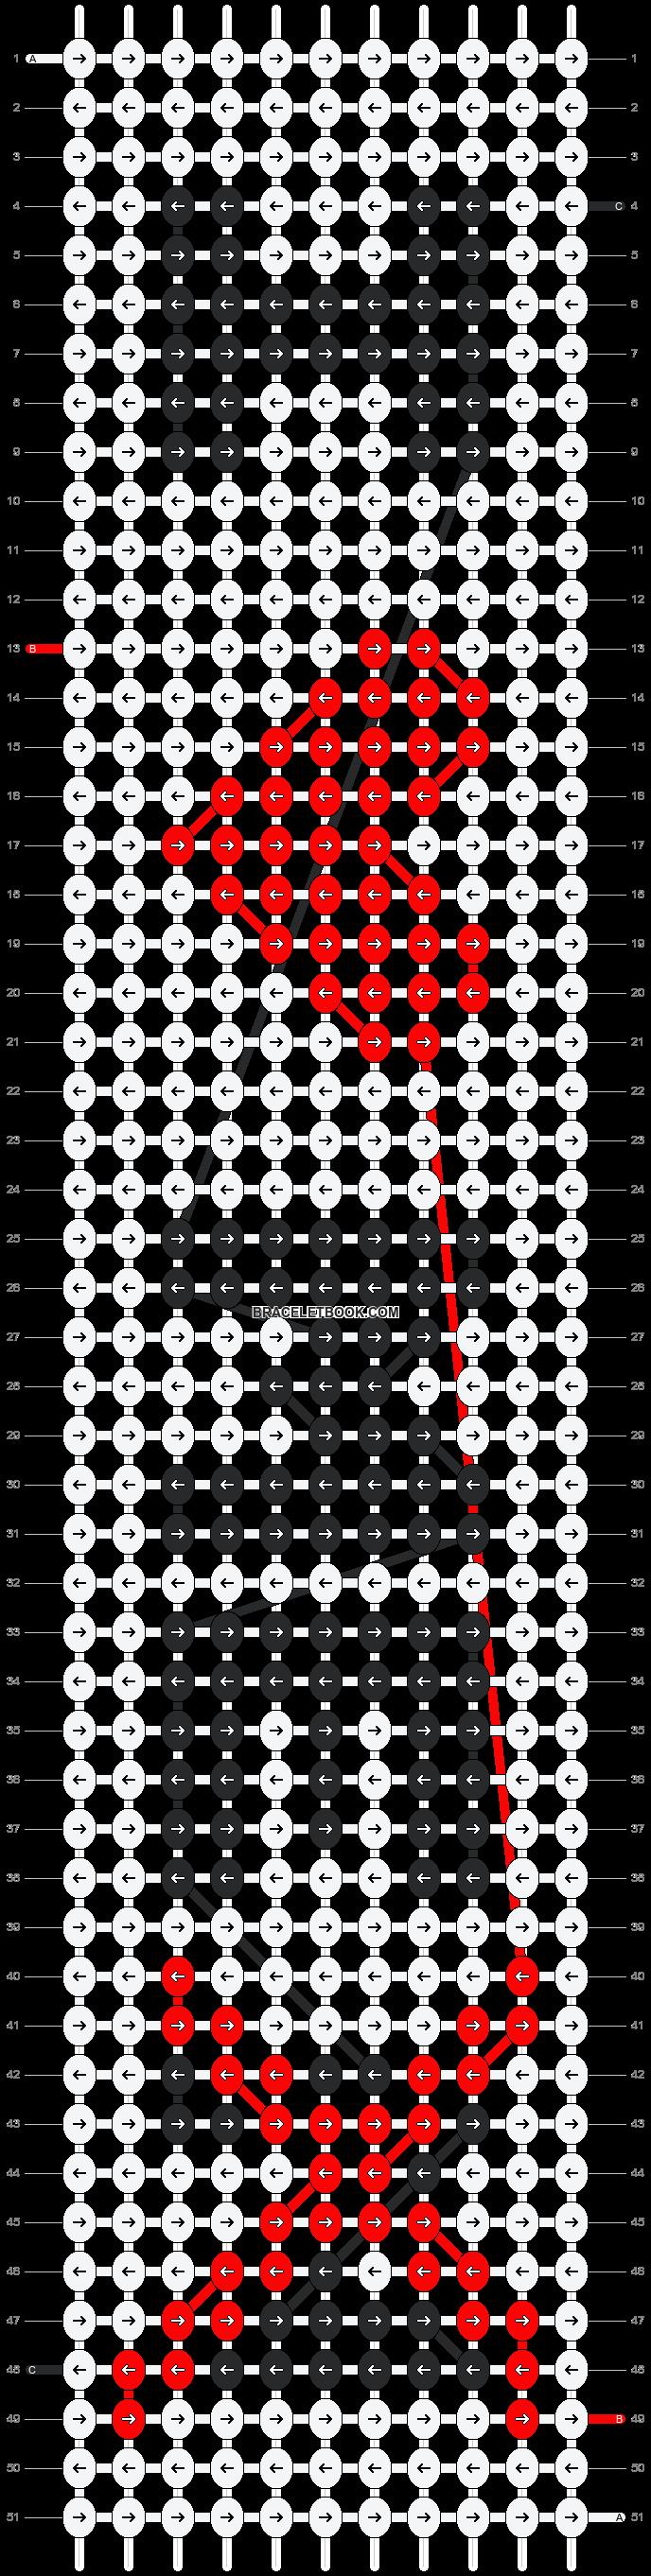 Alpha pattern #17536 pattern